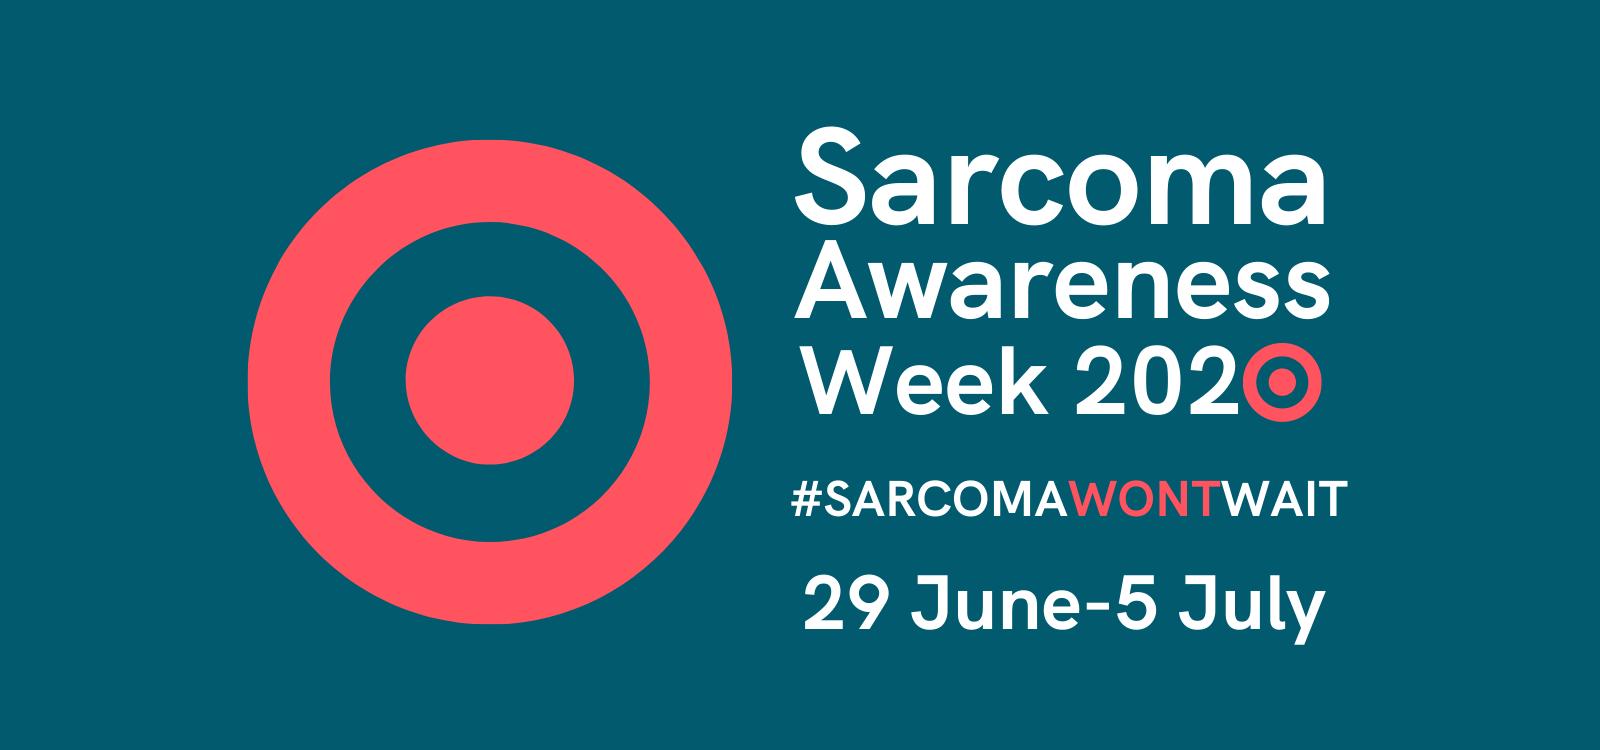 Sarcomas Awareness Week 29th June to 5th July #sarcomawontwait